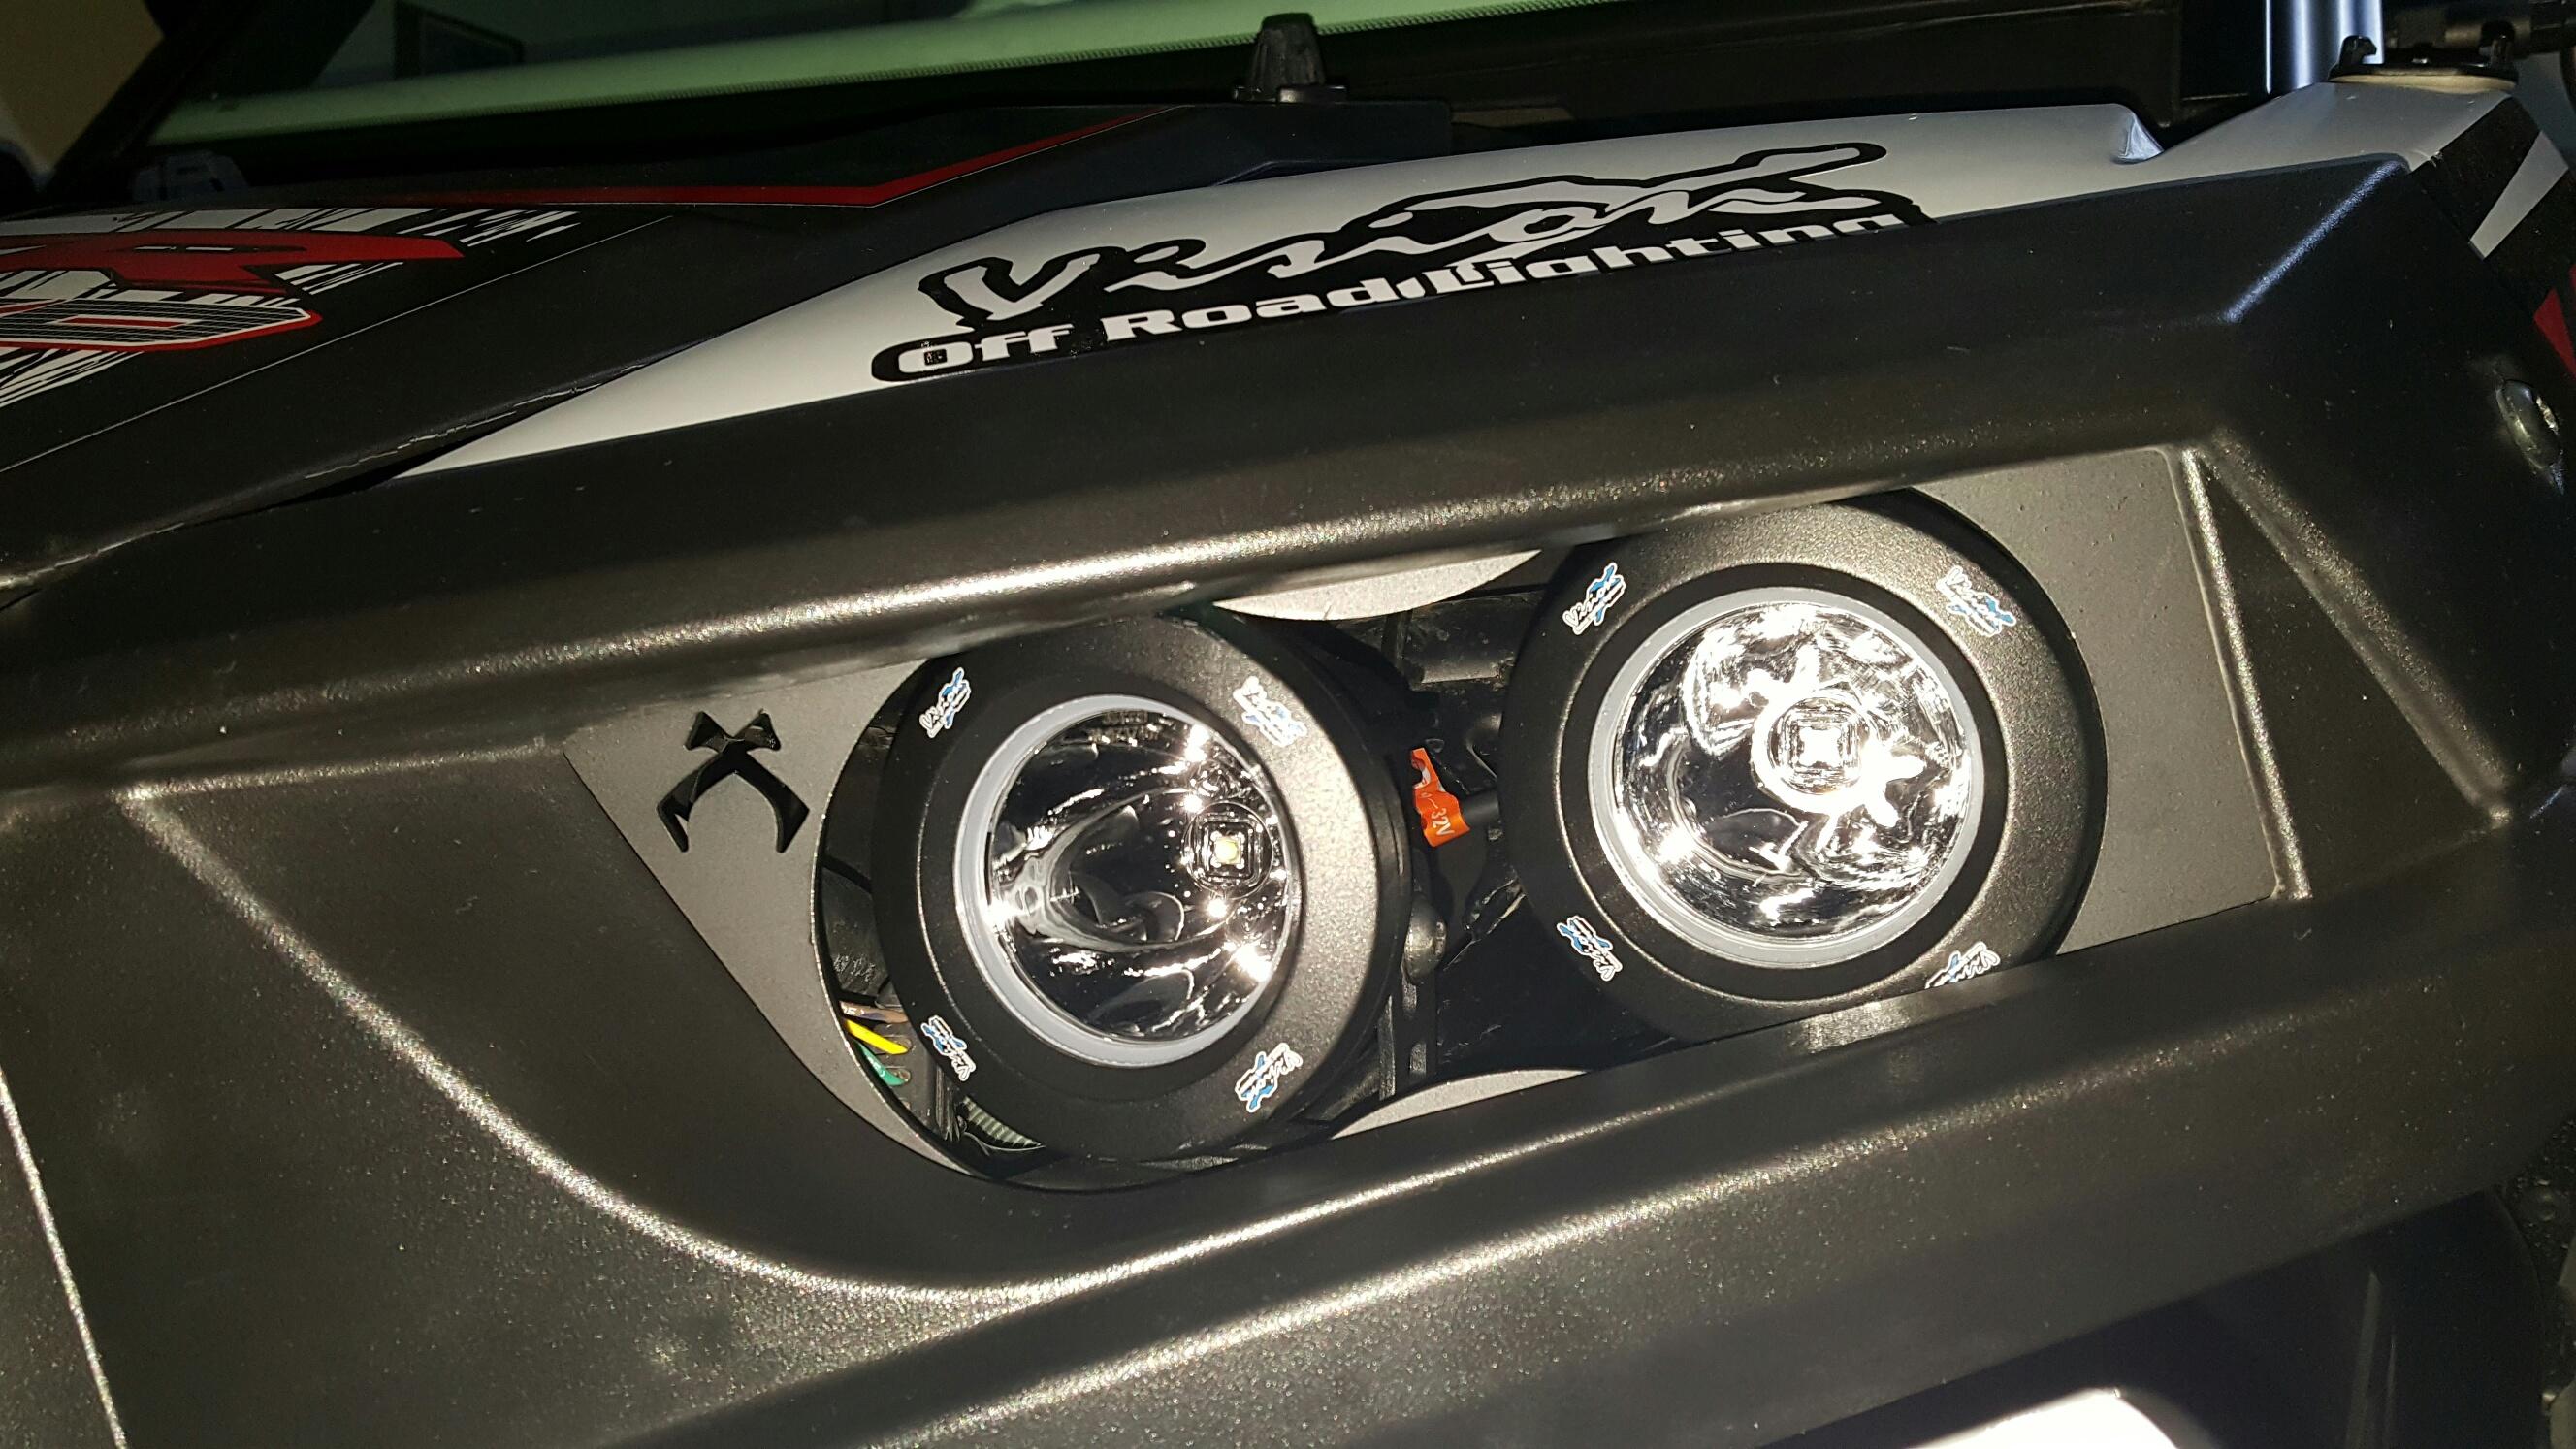 VisionX Polaris RZR XP1000900Turbo LED Replacement